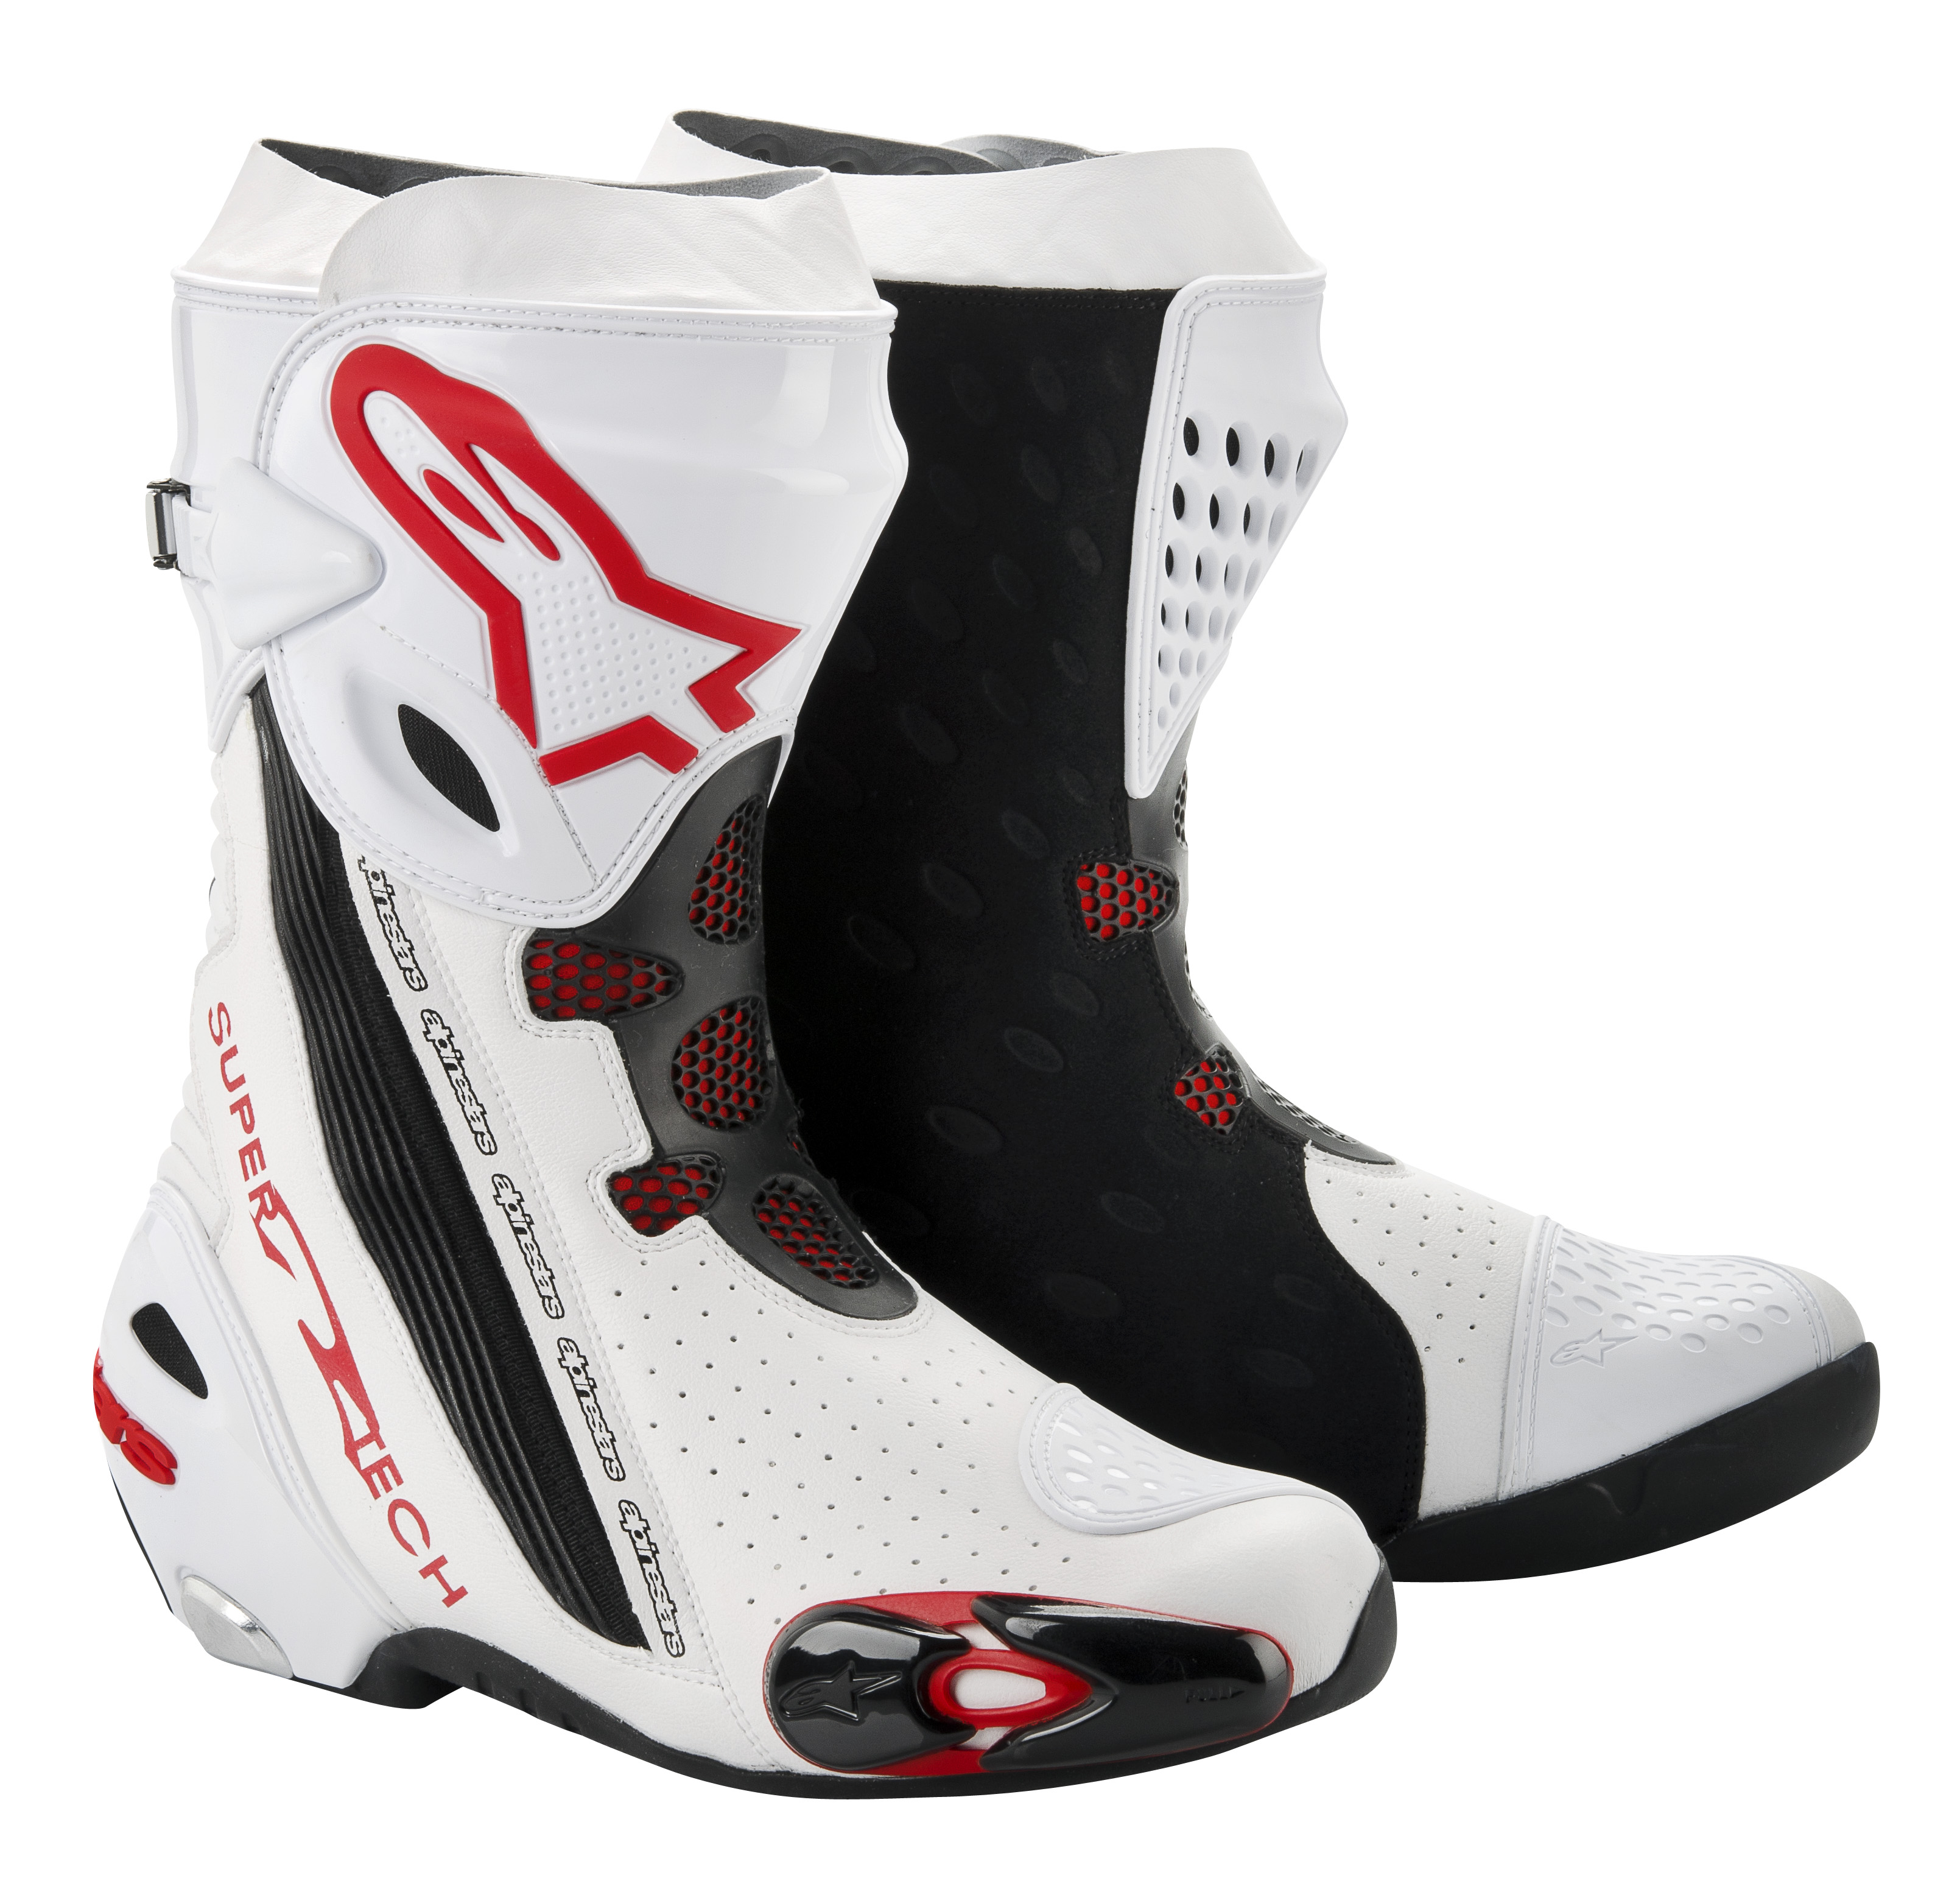 new alpinestars supertech r boots visordown. Black Bedroom Furniture Sets. Home Design Ideas